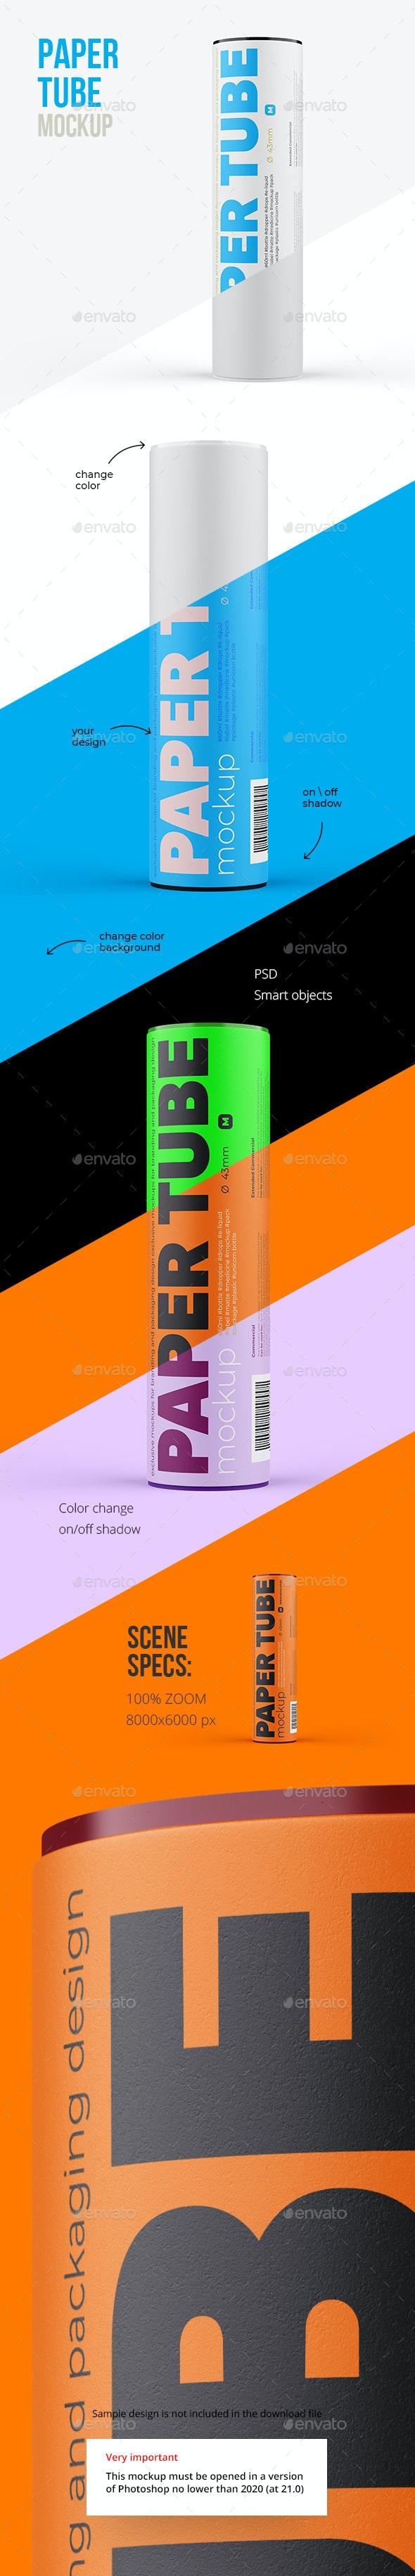 Paper Tube Mockup 43x152mm - Packaging Product Mock-Ups